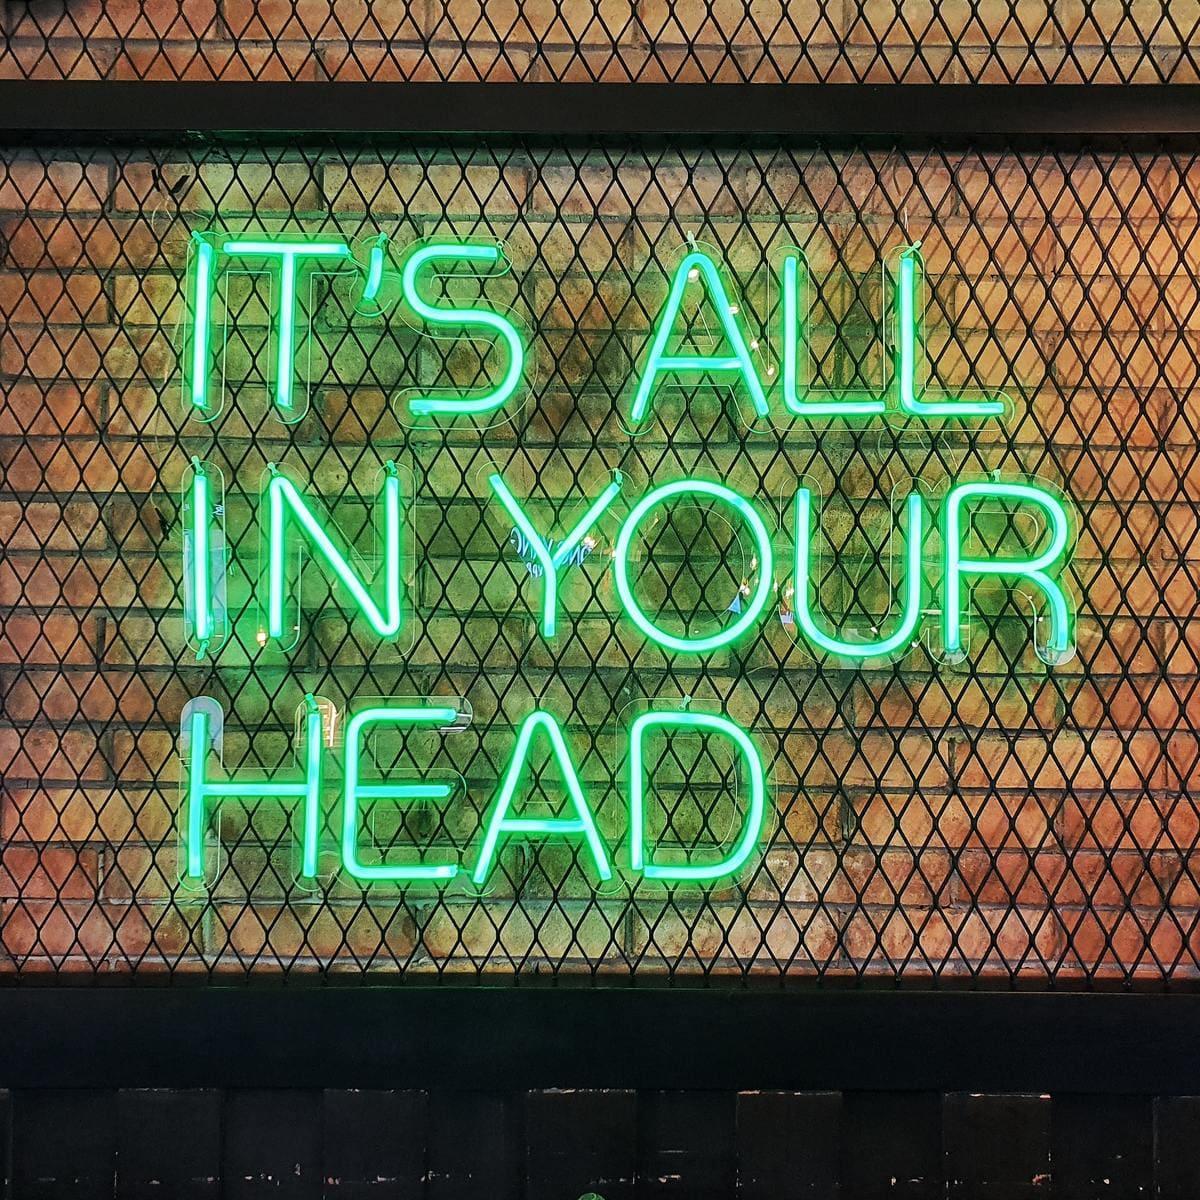 pared con neón con mensaje its all in your head